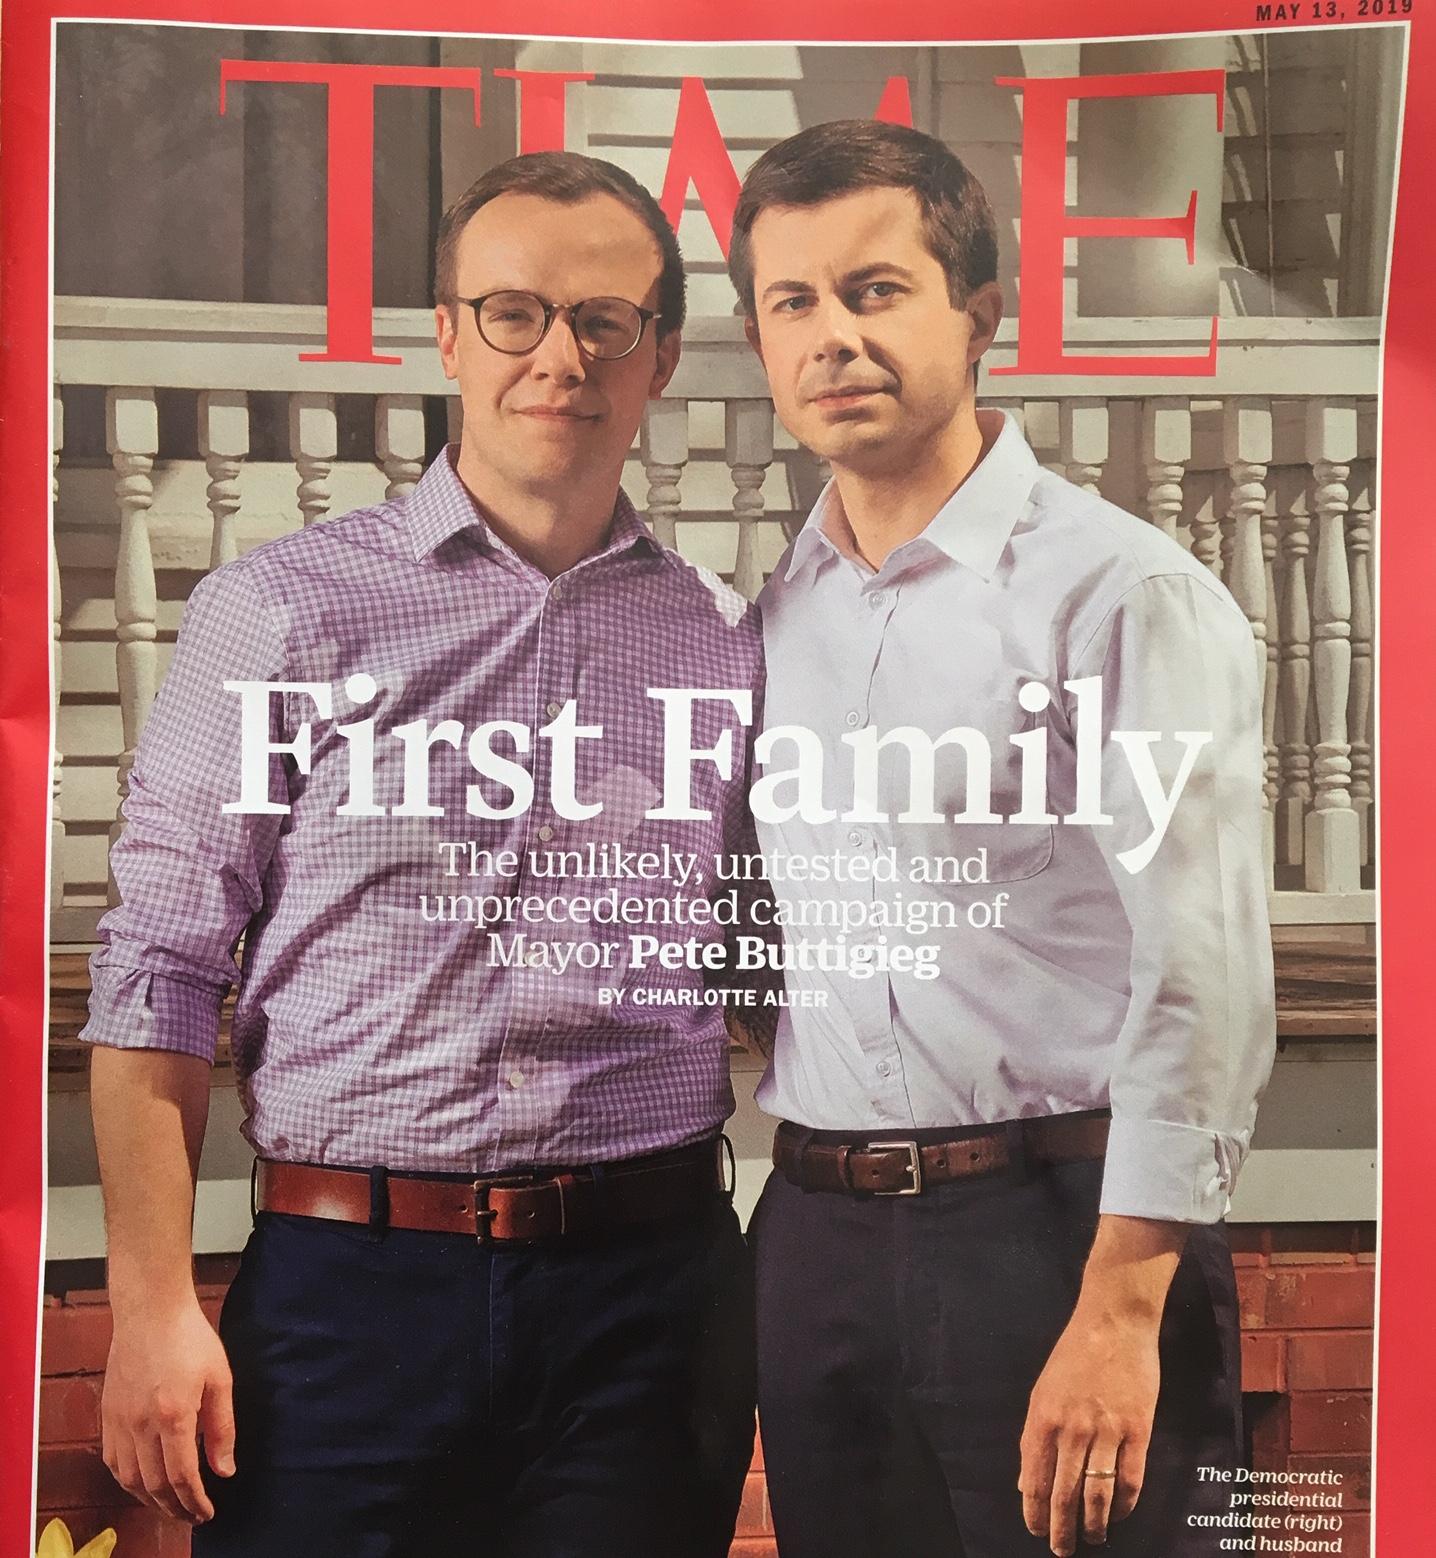 Time magazine cover May 13, 2019: Pete Buttigeg and husband Chasten Glezman Buttigieg.